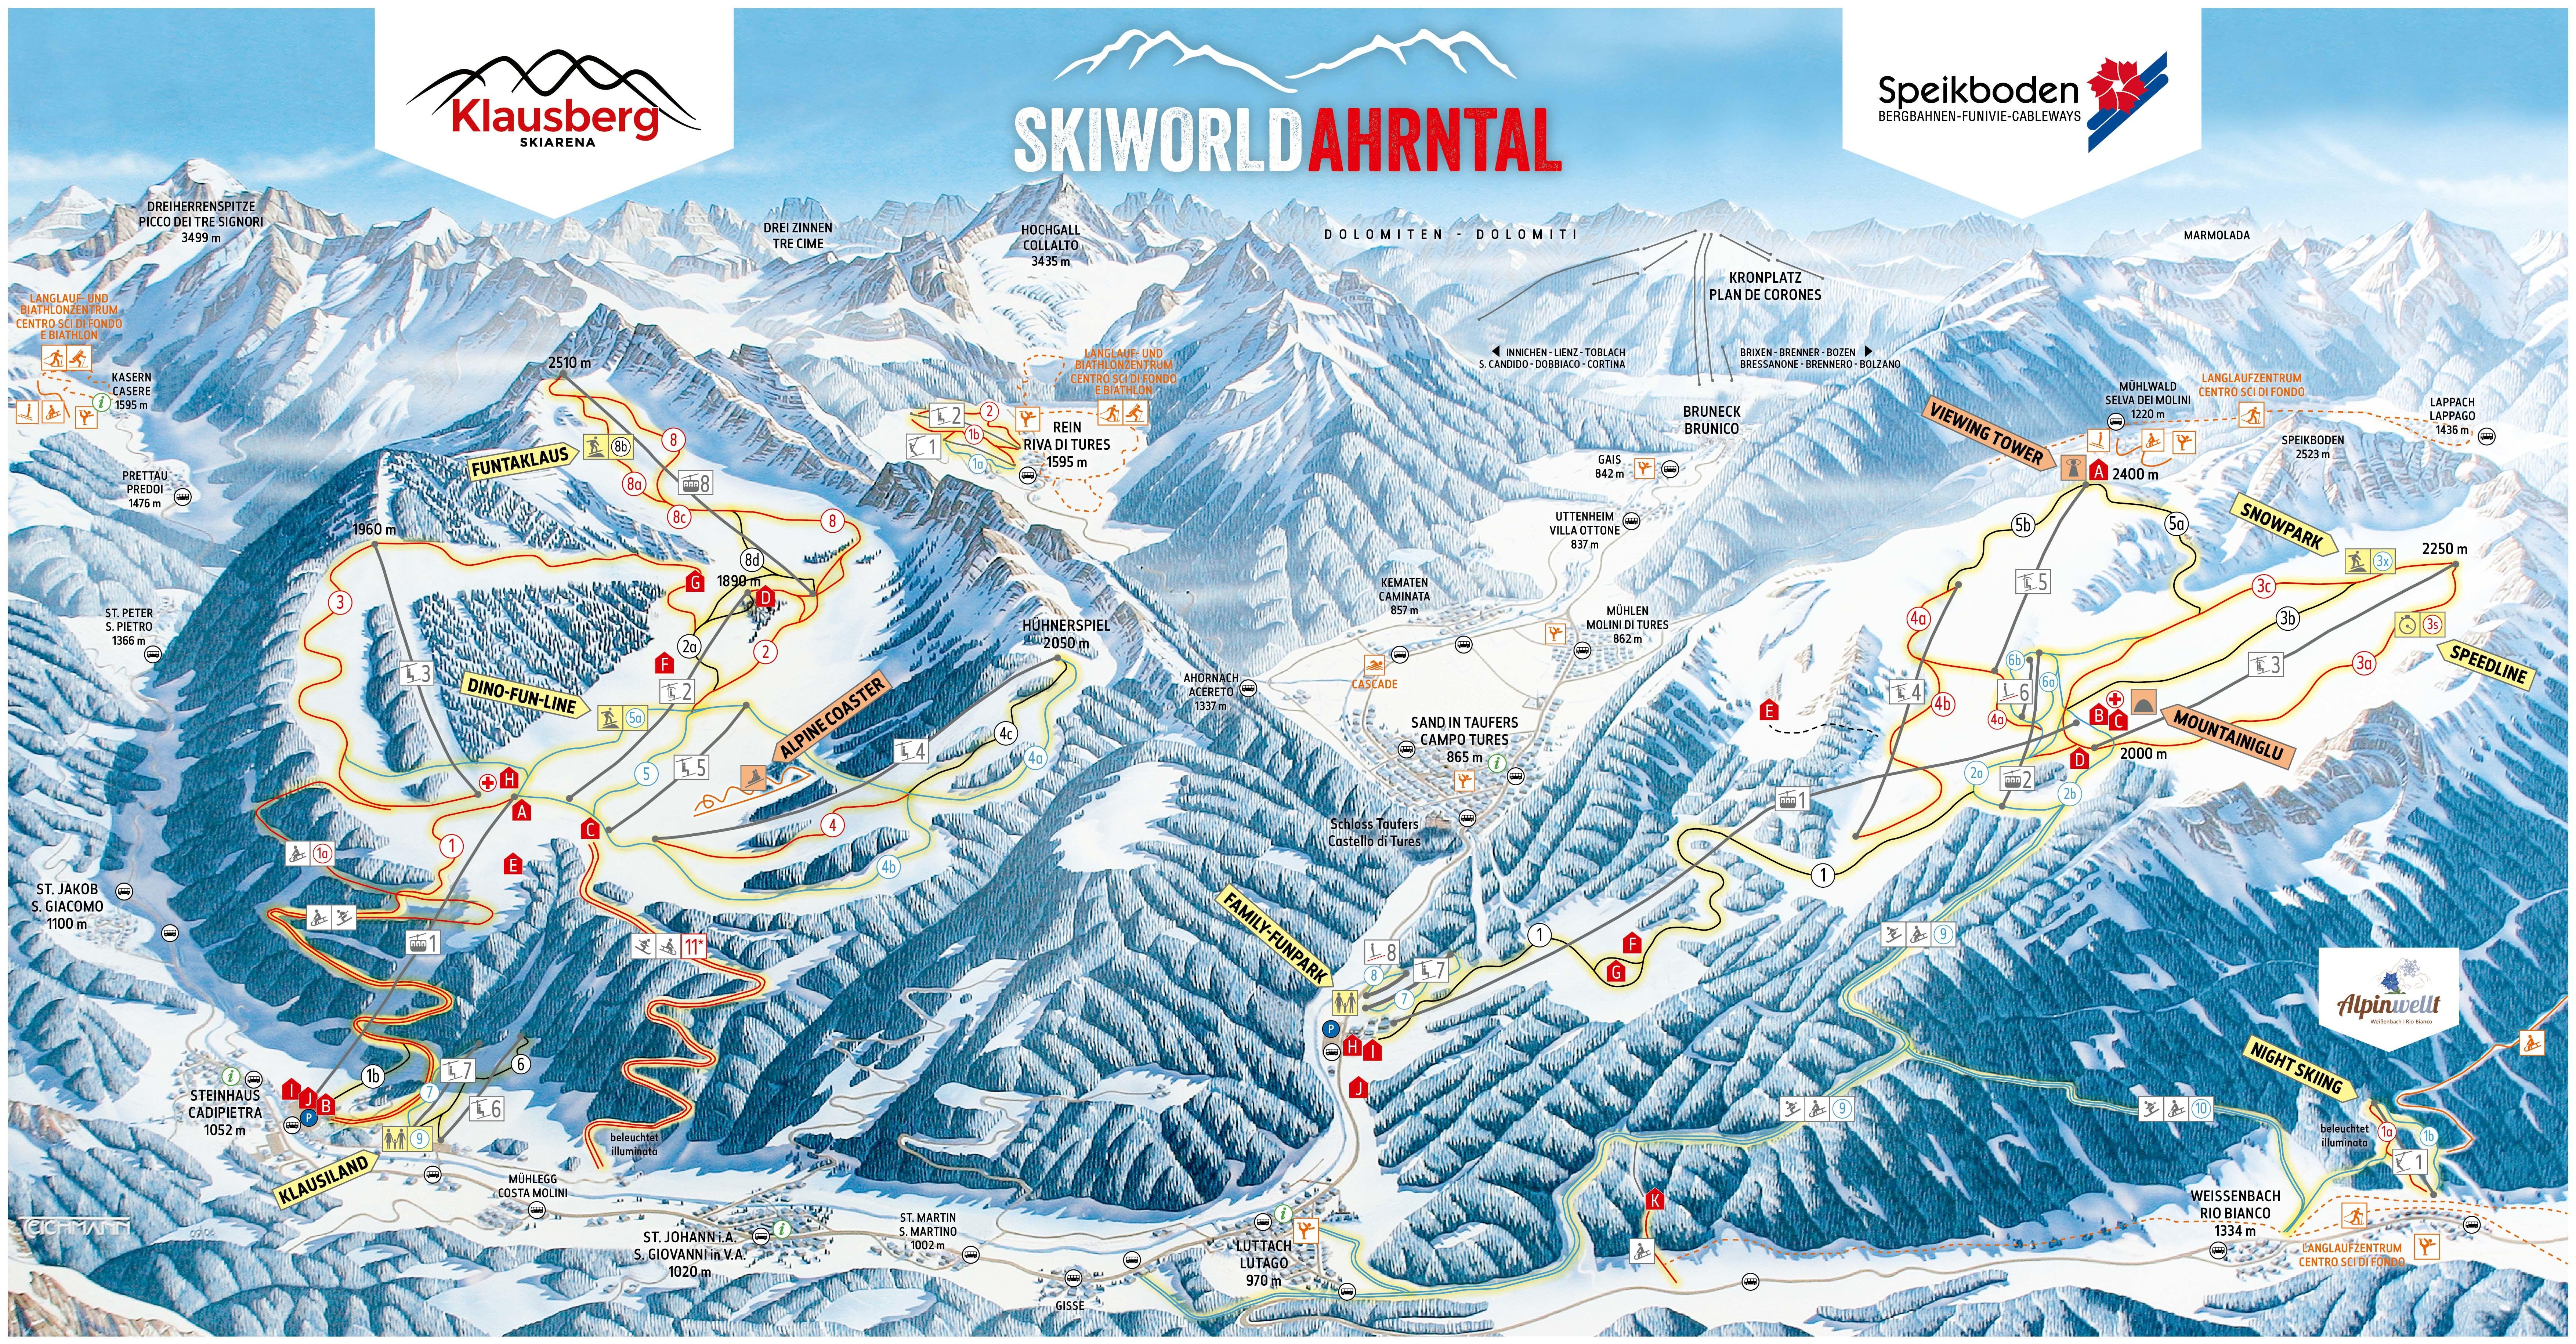 Klausberg Piste Map   Plan of ski slopes and lifts   OnTheSnow